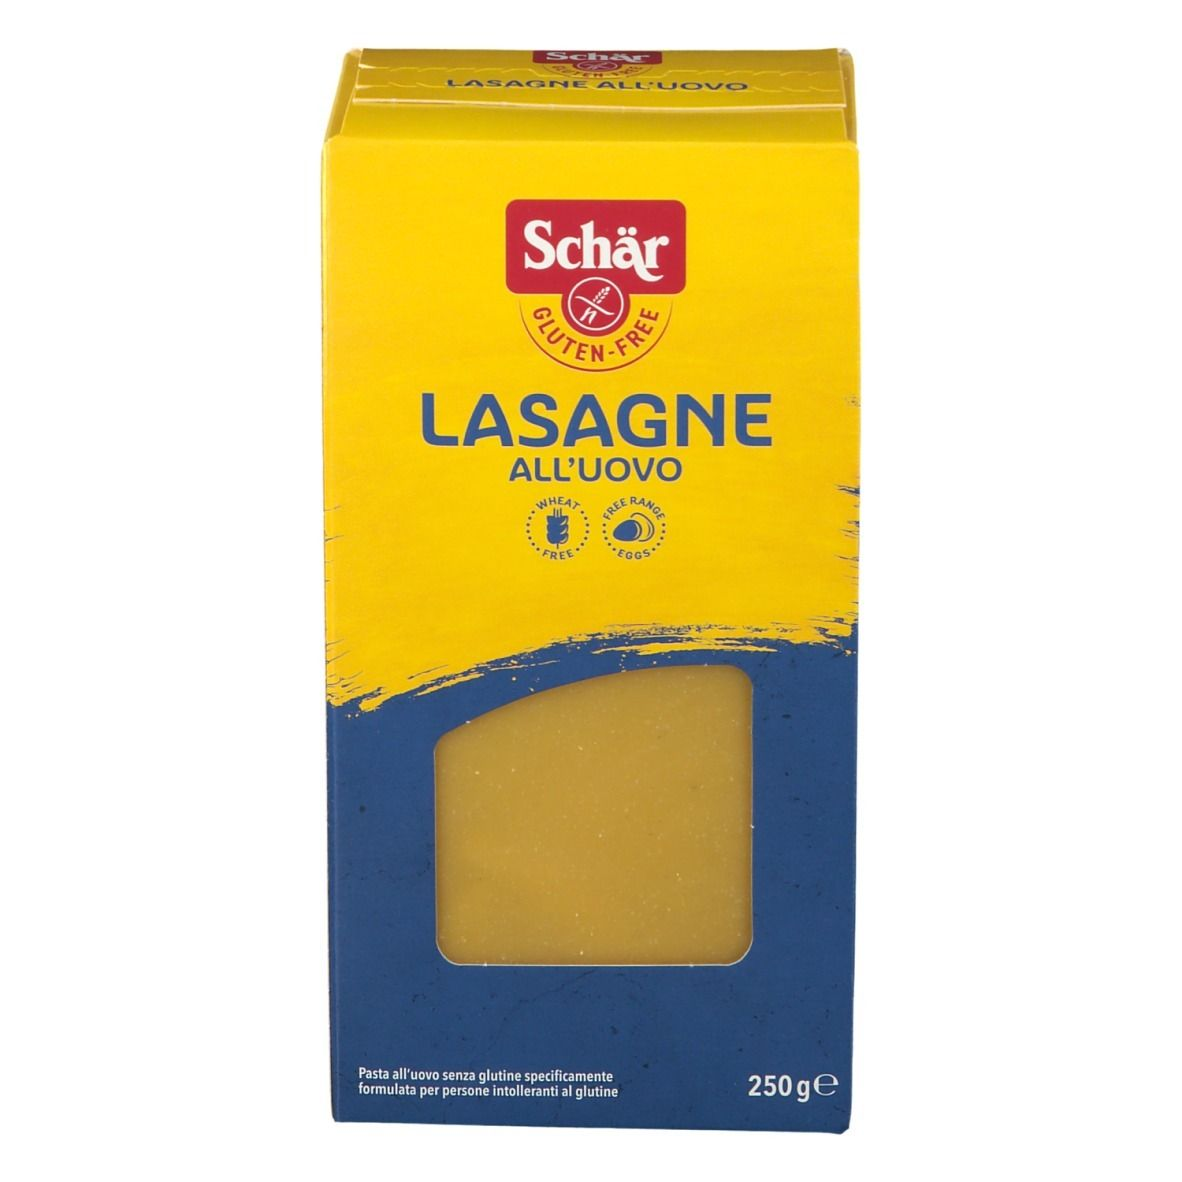 Schär Lasagne